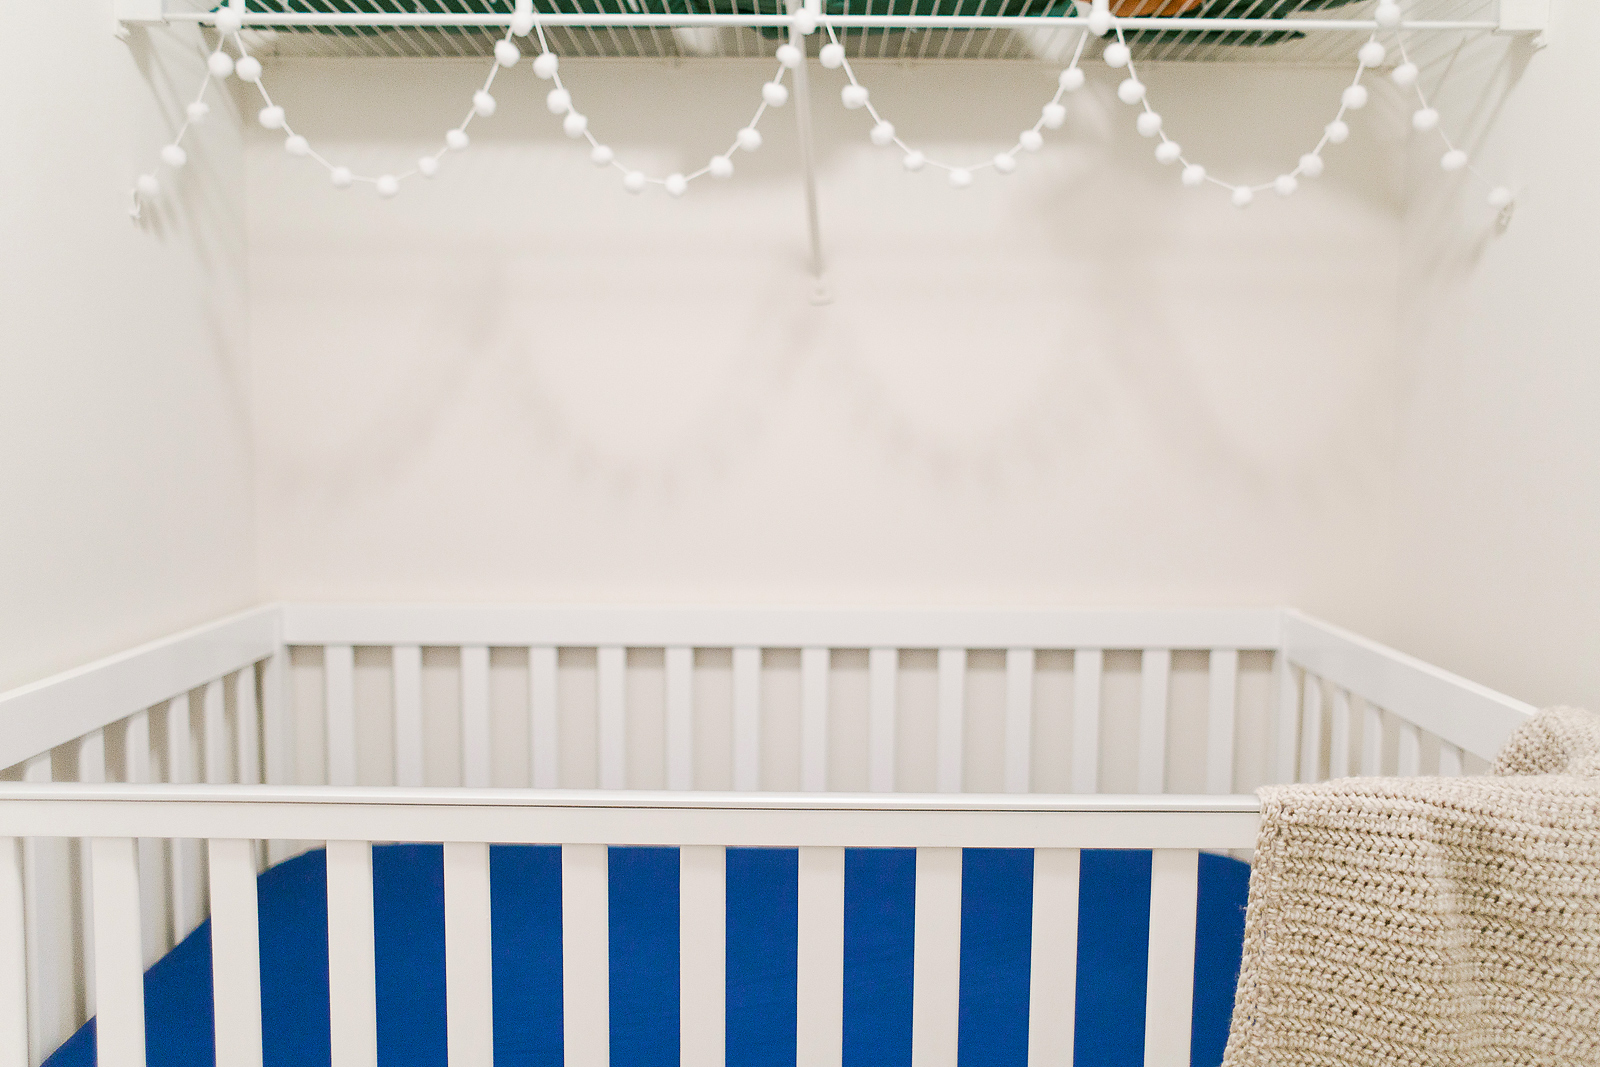 closet_baby_nursery_003.jpg